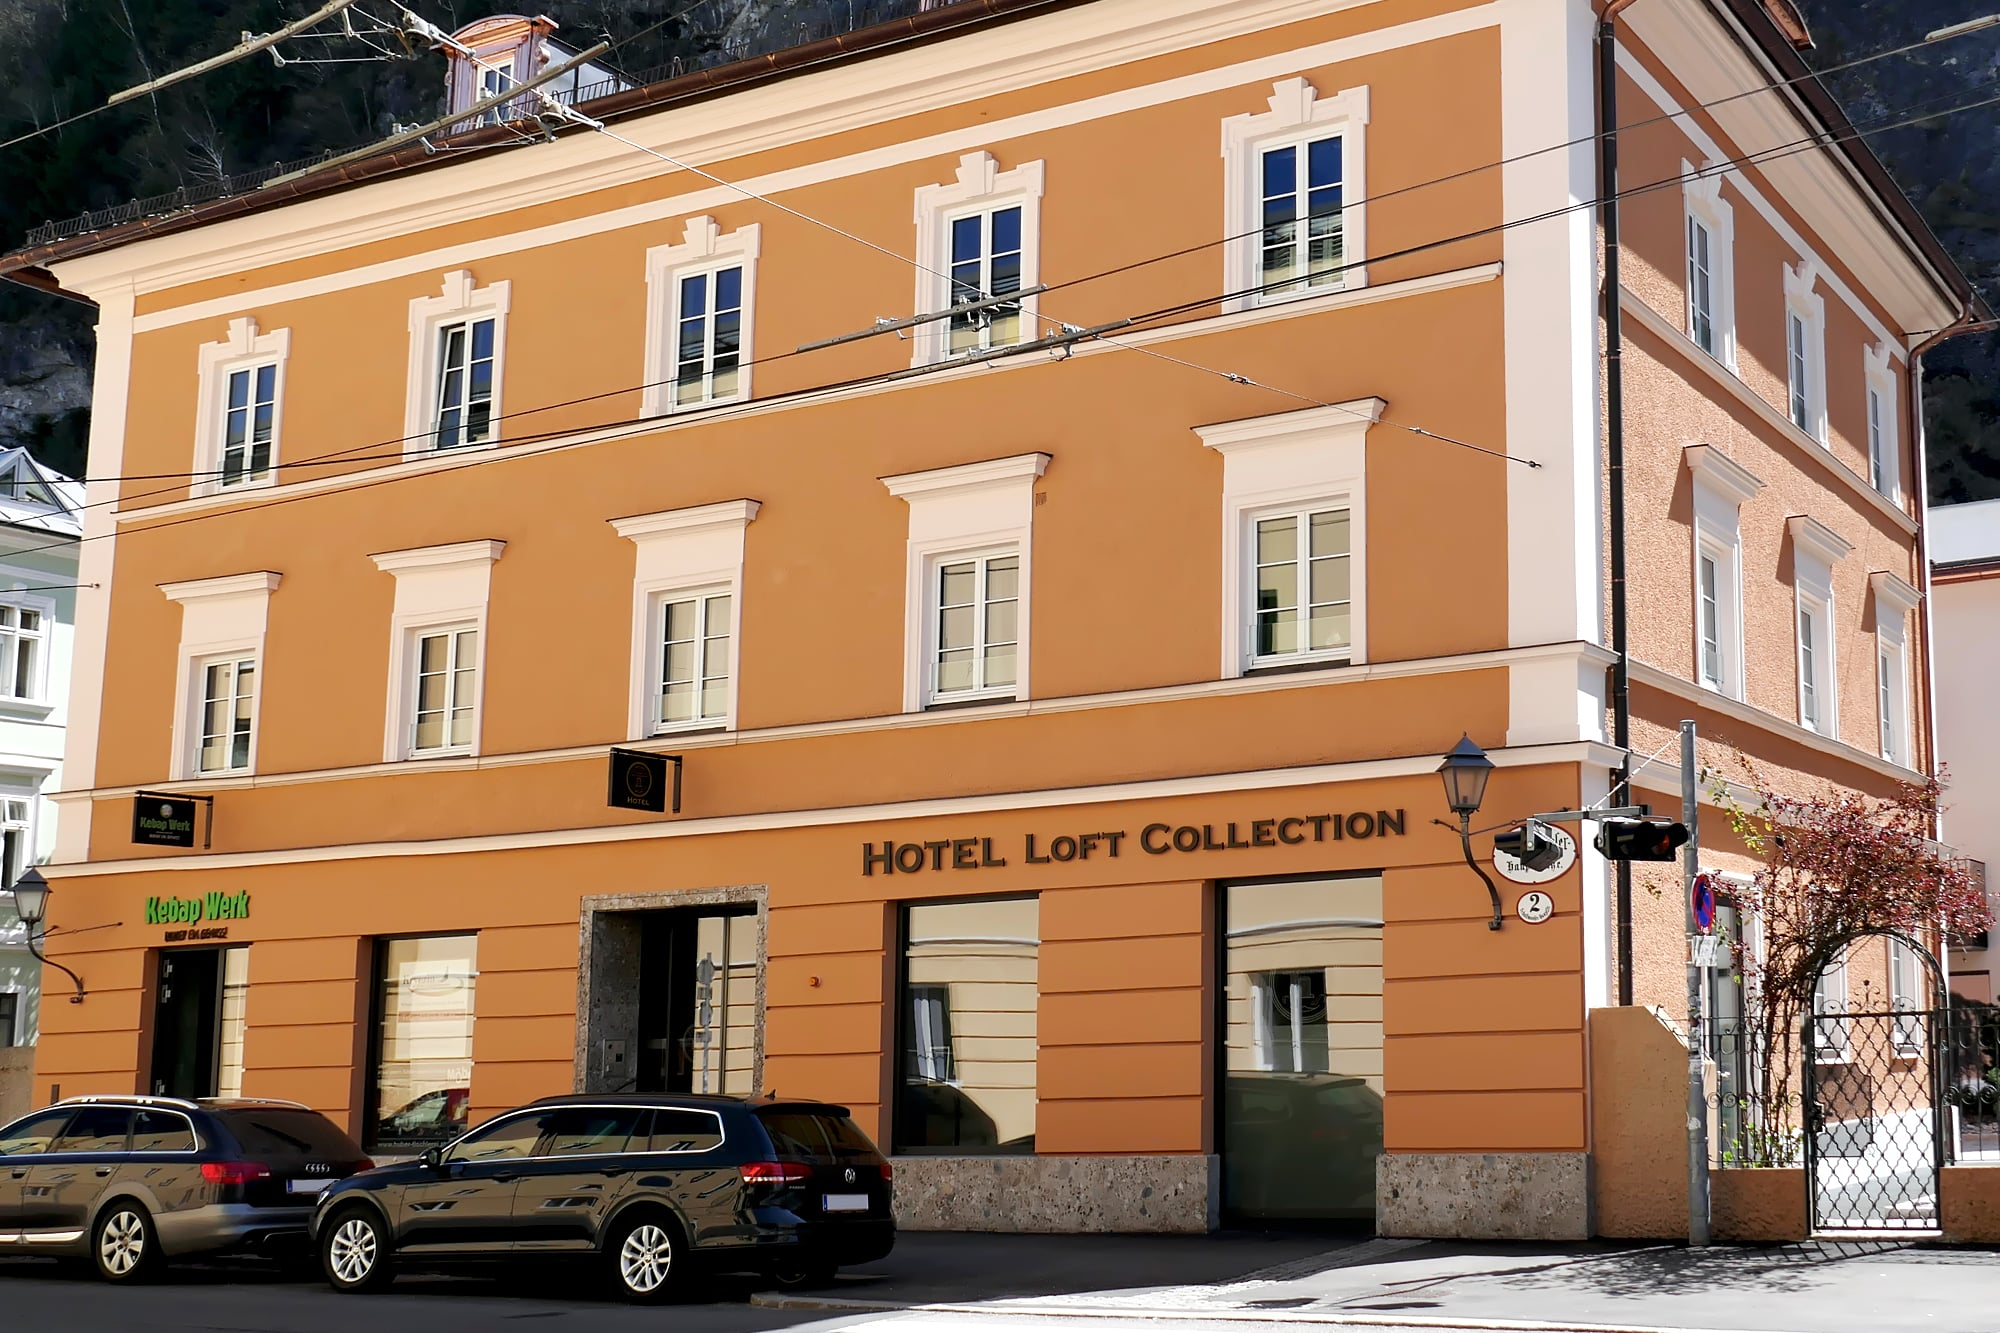 Loft Collection Linzergasse Exterior view